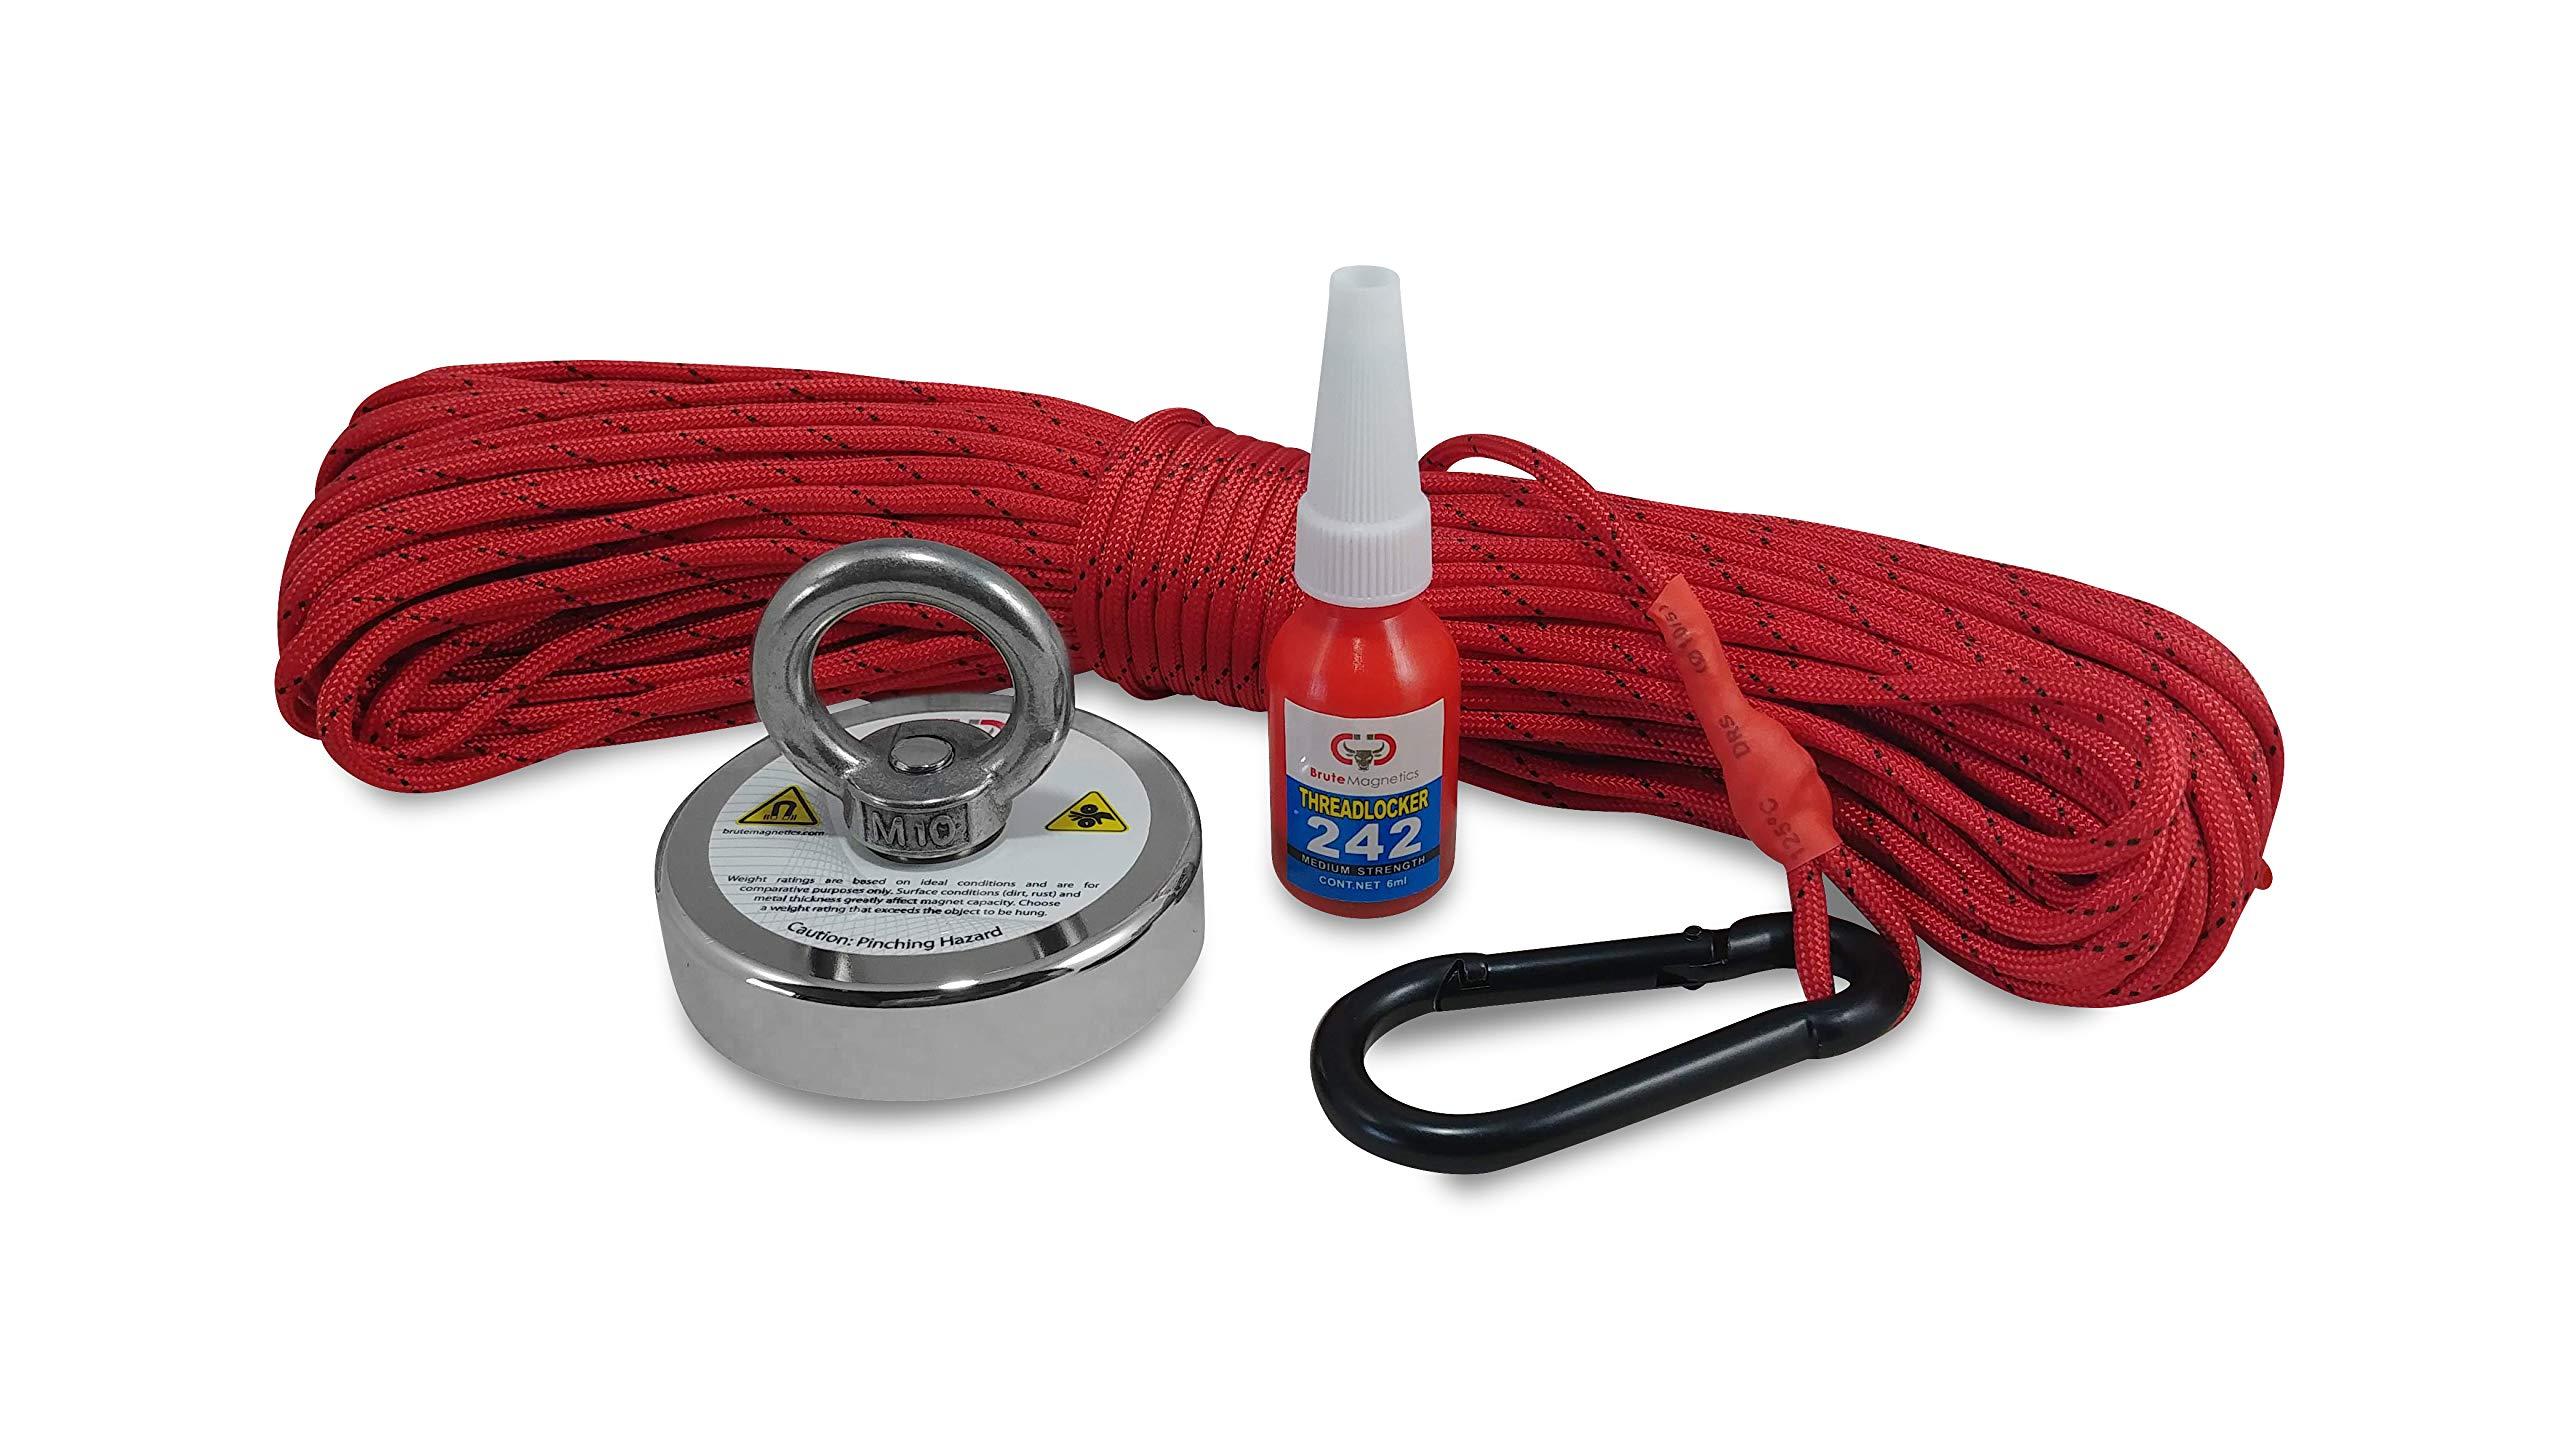 575 LBS Magnet Fishing Bundle - Brute Magnetics Round Neodymium Fishing Magnet, 2.95'' Magnet + 100 feet Rope with Carabiner + threadlocker